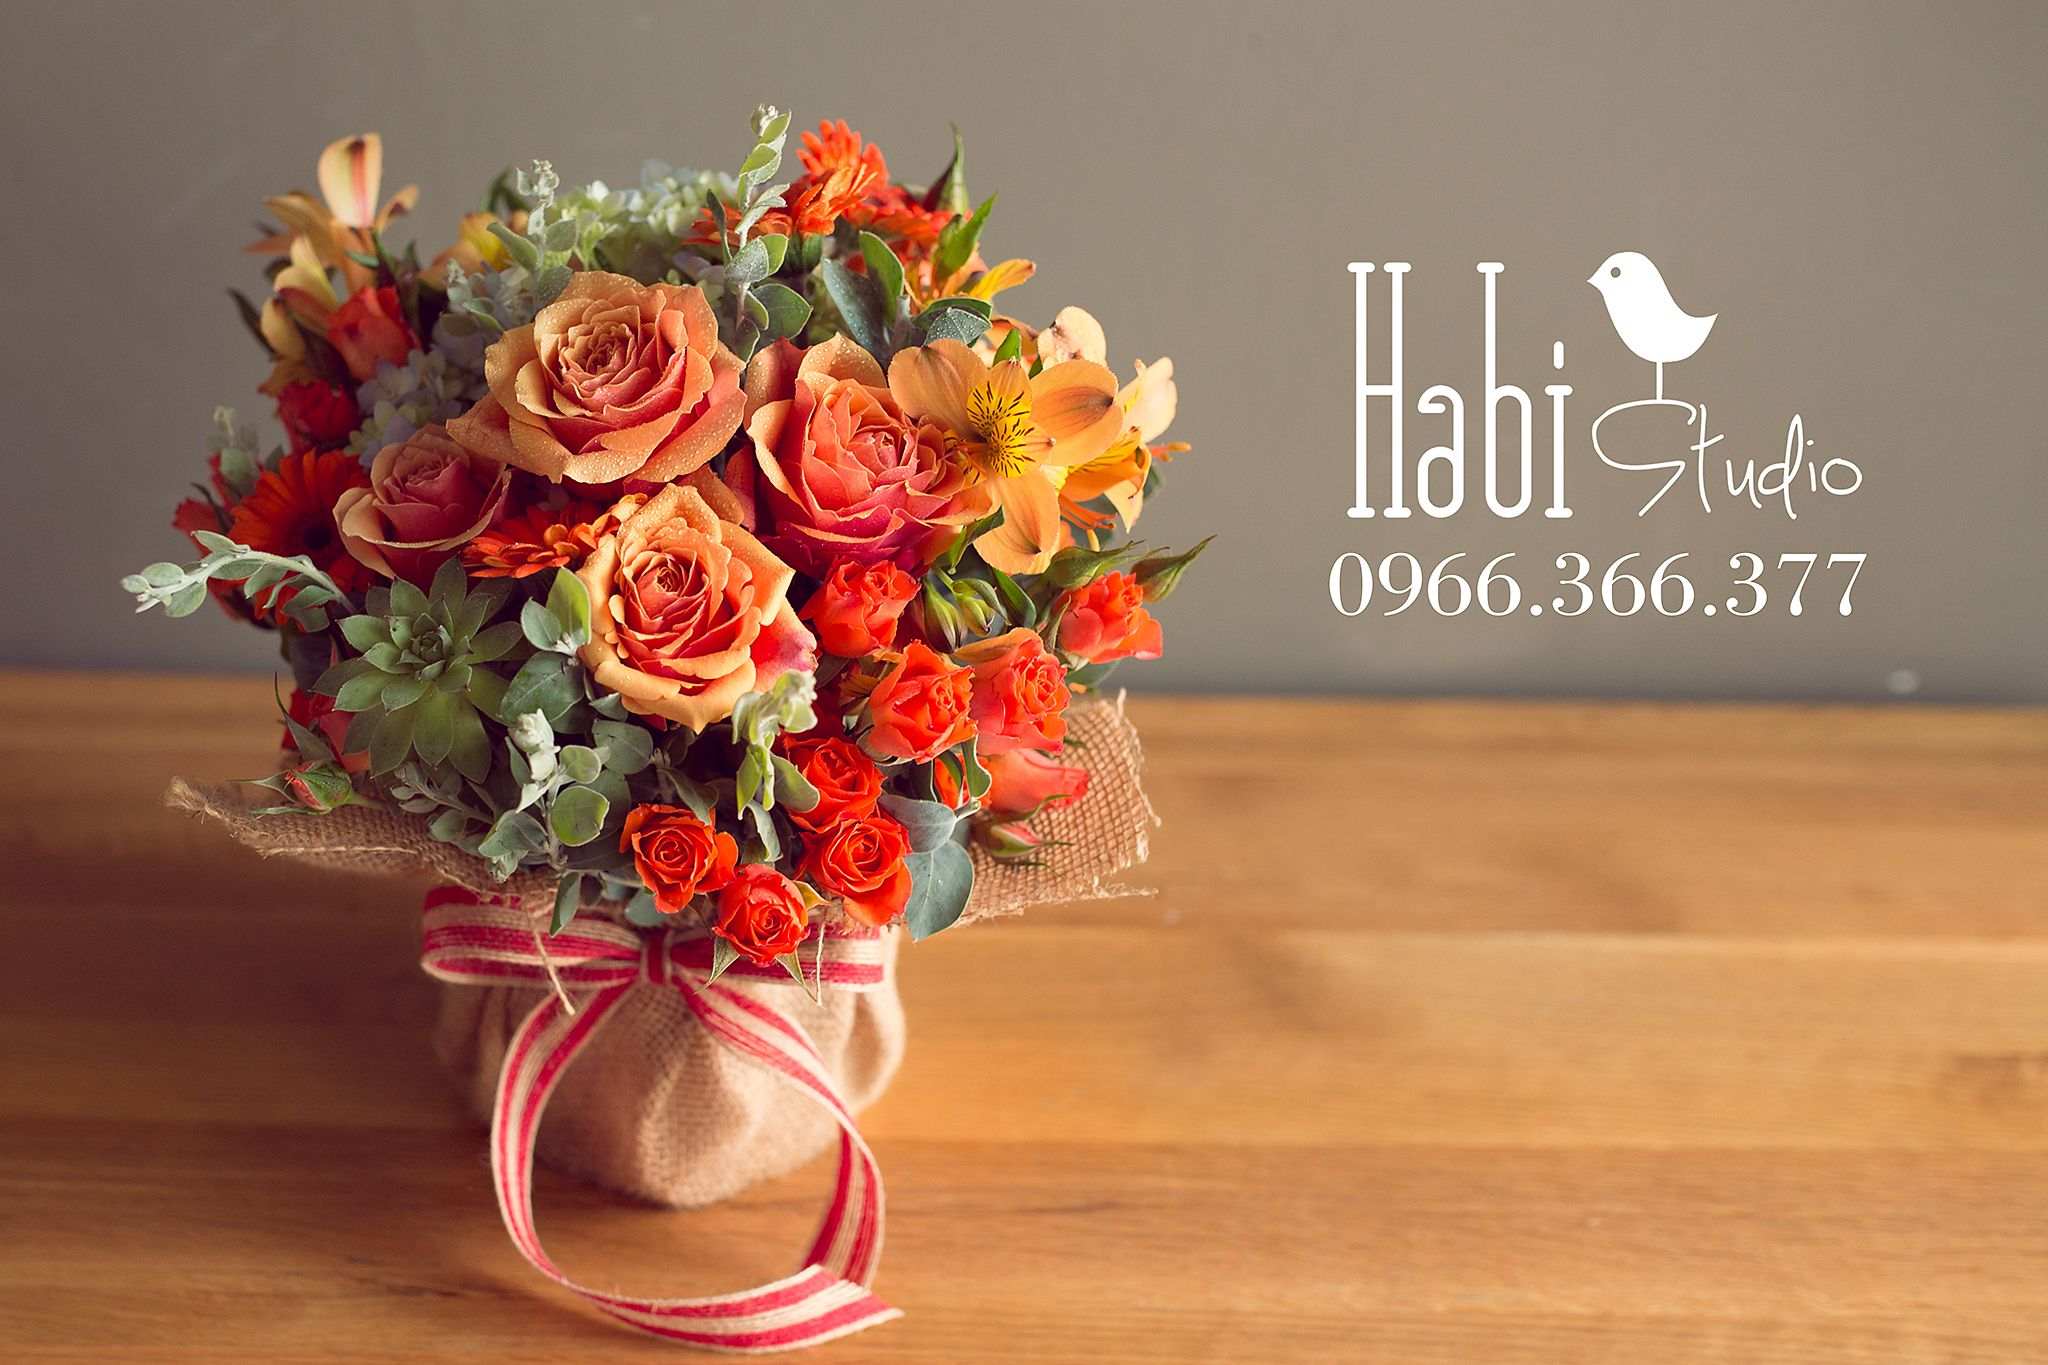 Habi Flower, Habi Studio, Flower Arrangement, Birthday Flower, Habi Design,